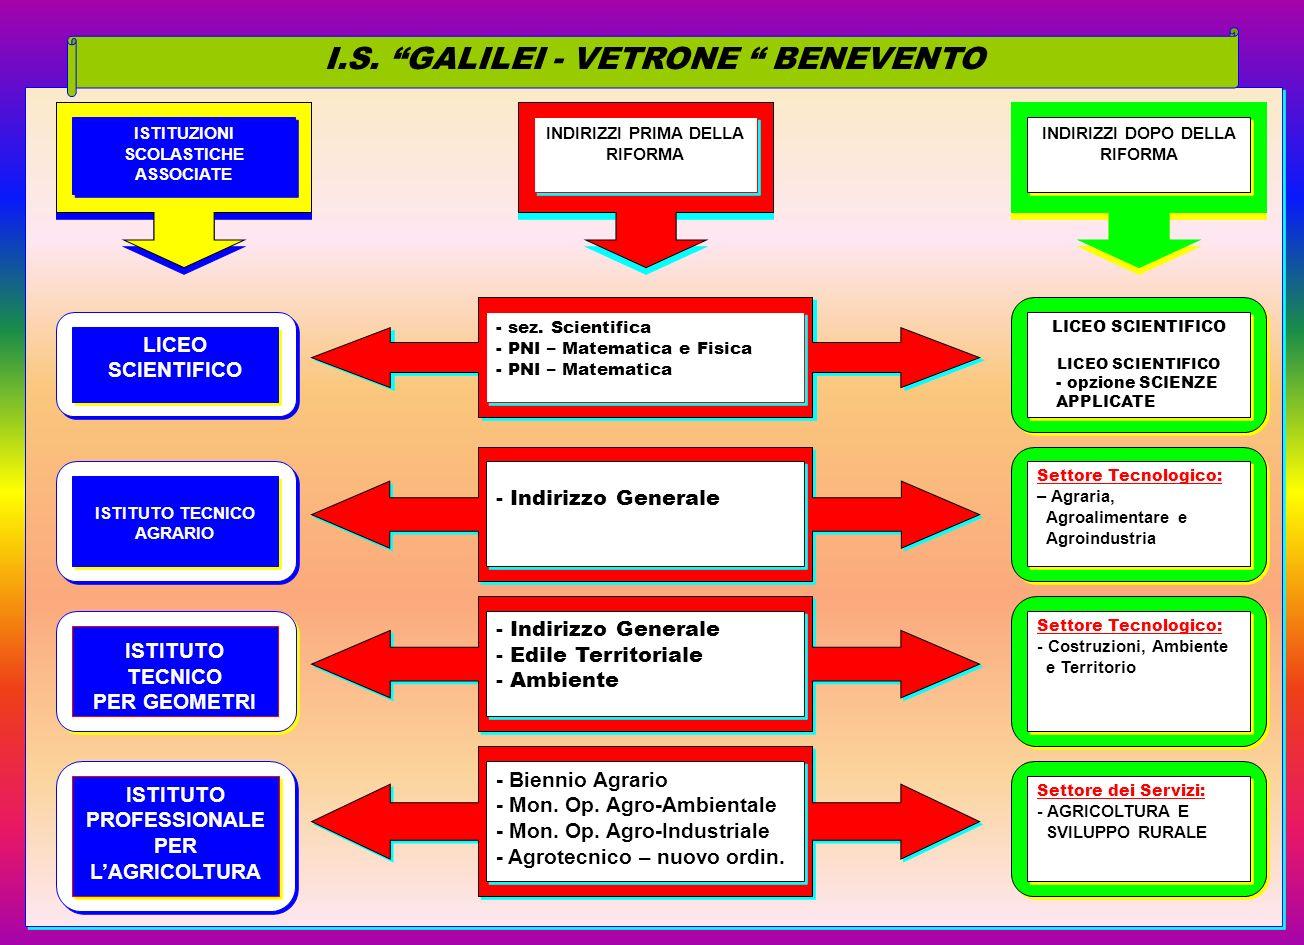 I.S. GALILEI - VETRONE BENEVENTO